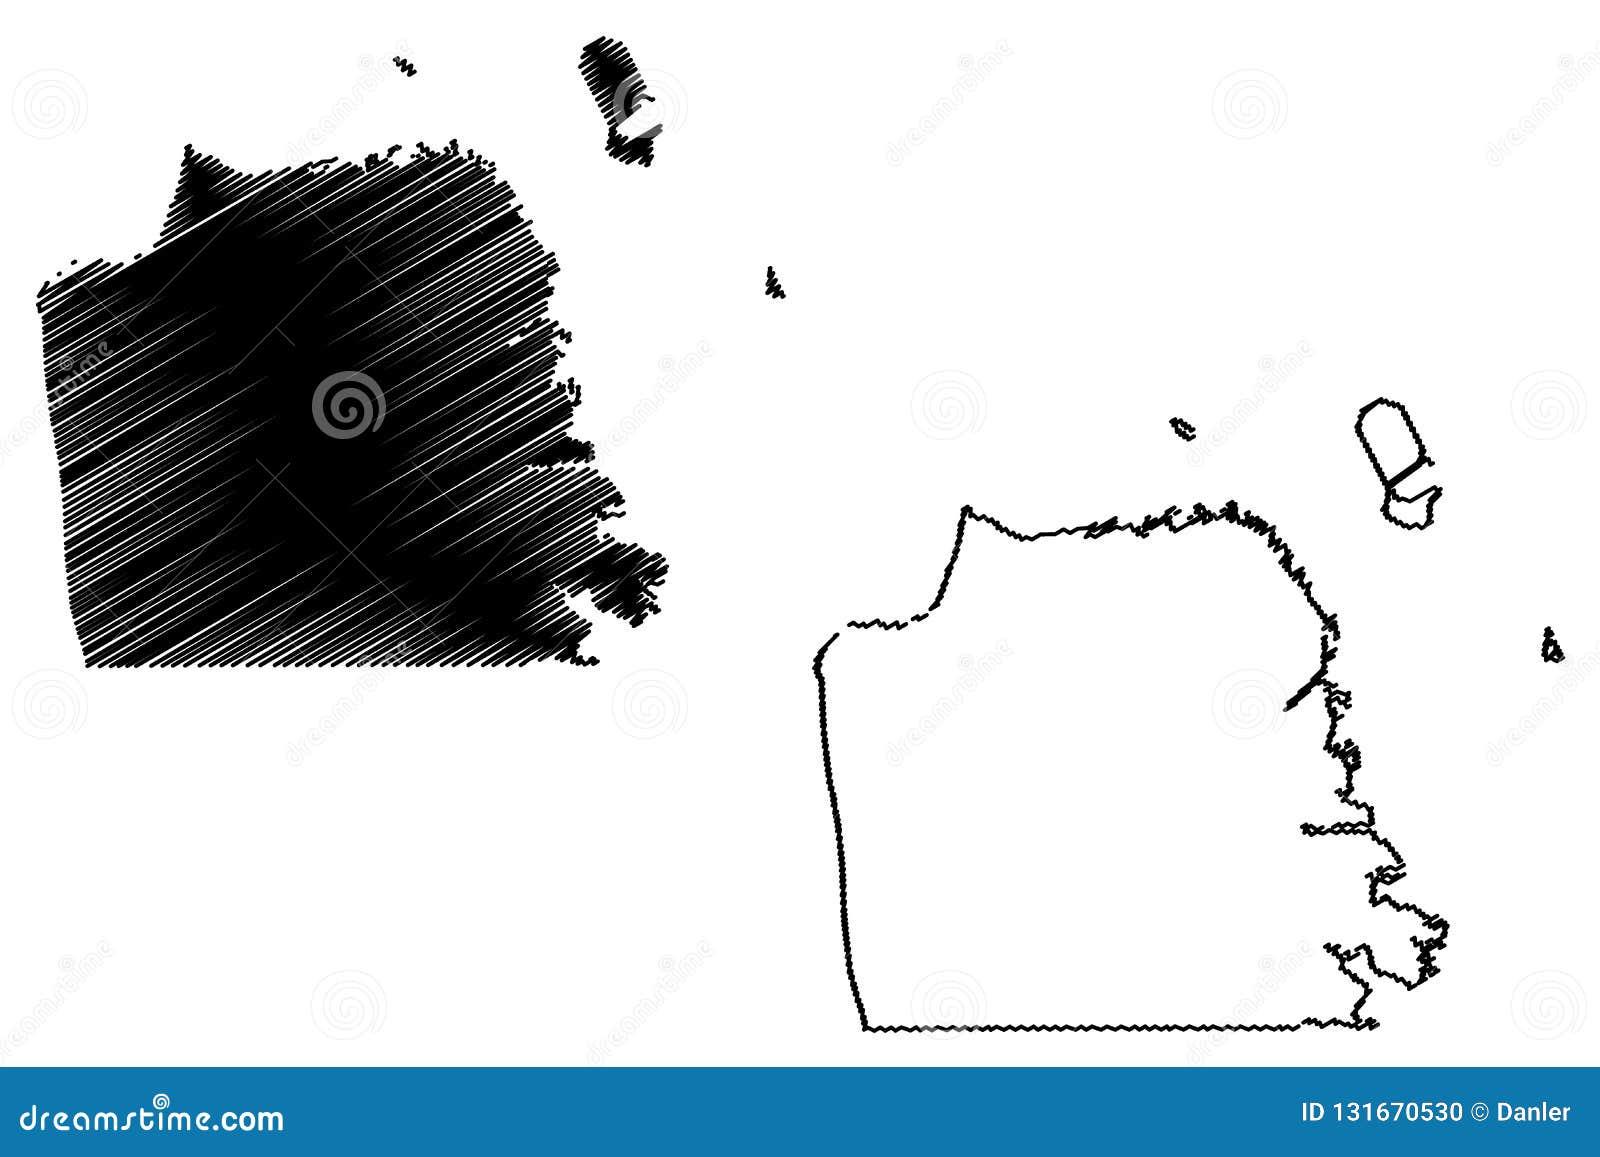 San Francisco City Map Vector Stock Vector - Illustration of ...